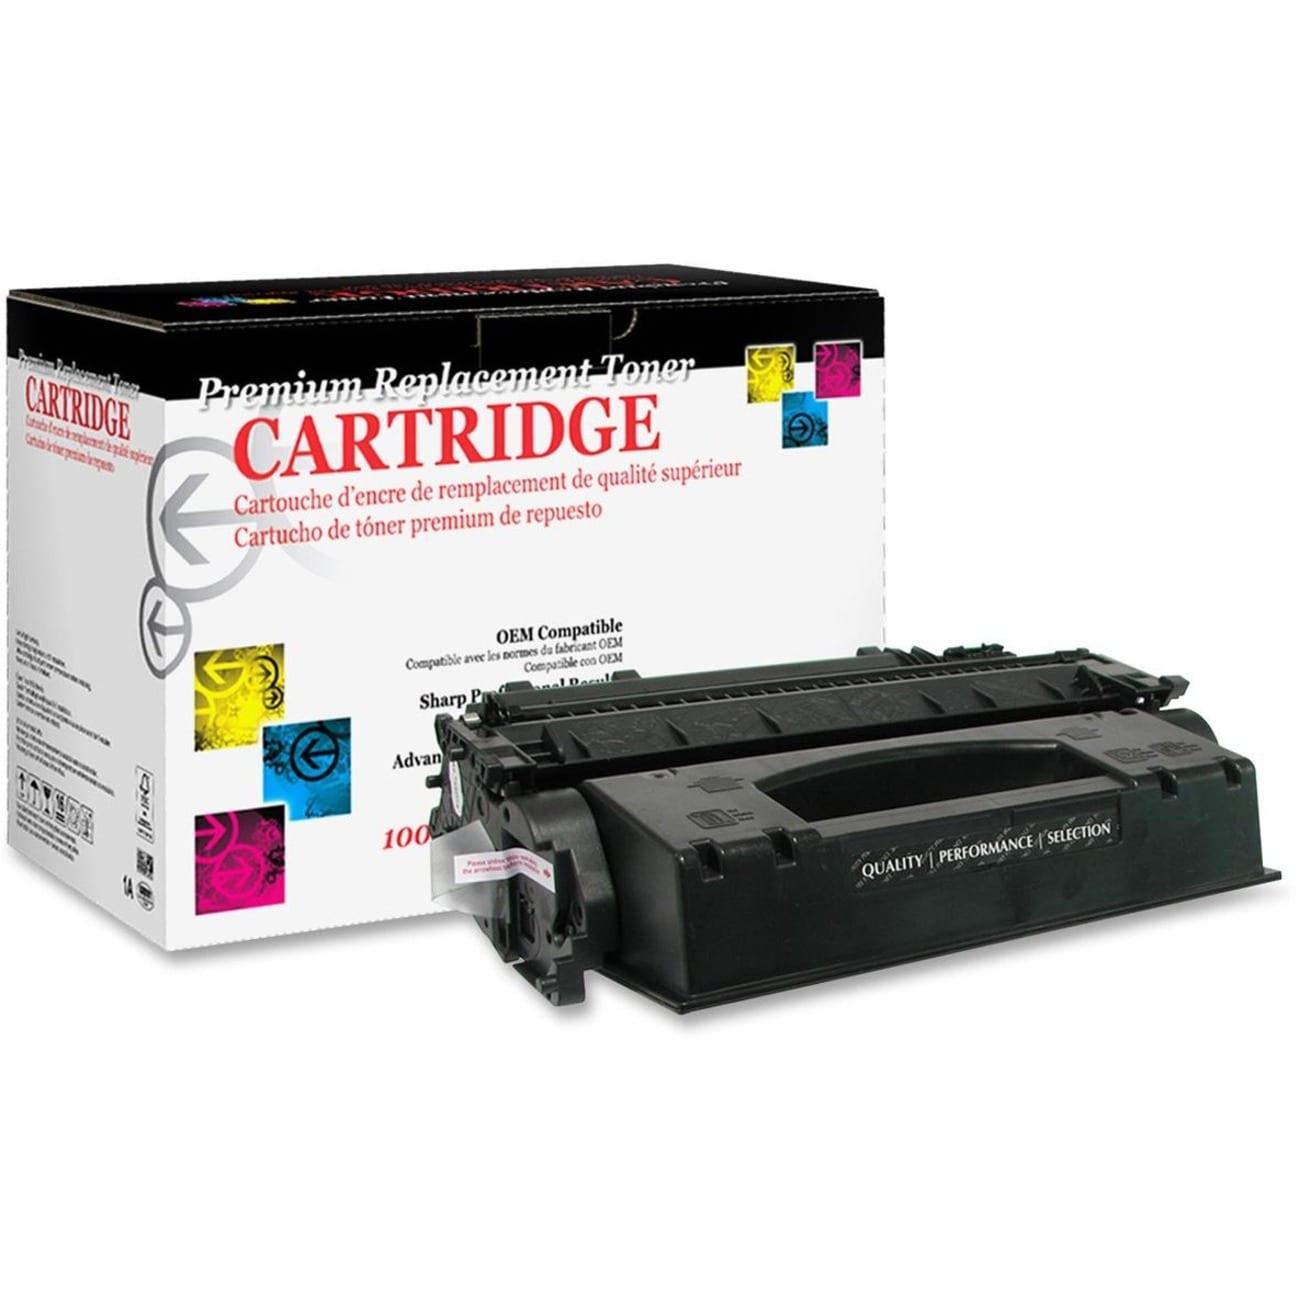 West Point Remanufactured Toner Cartridge - Alternative f...